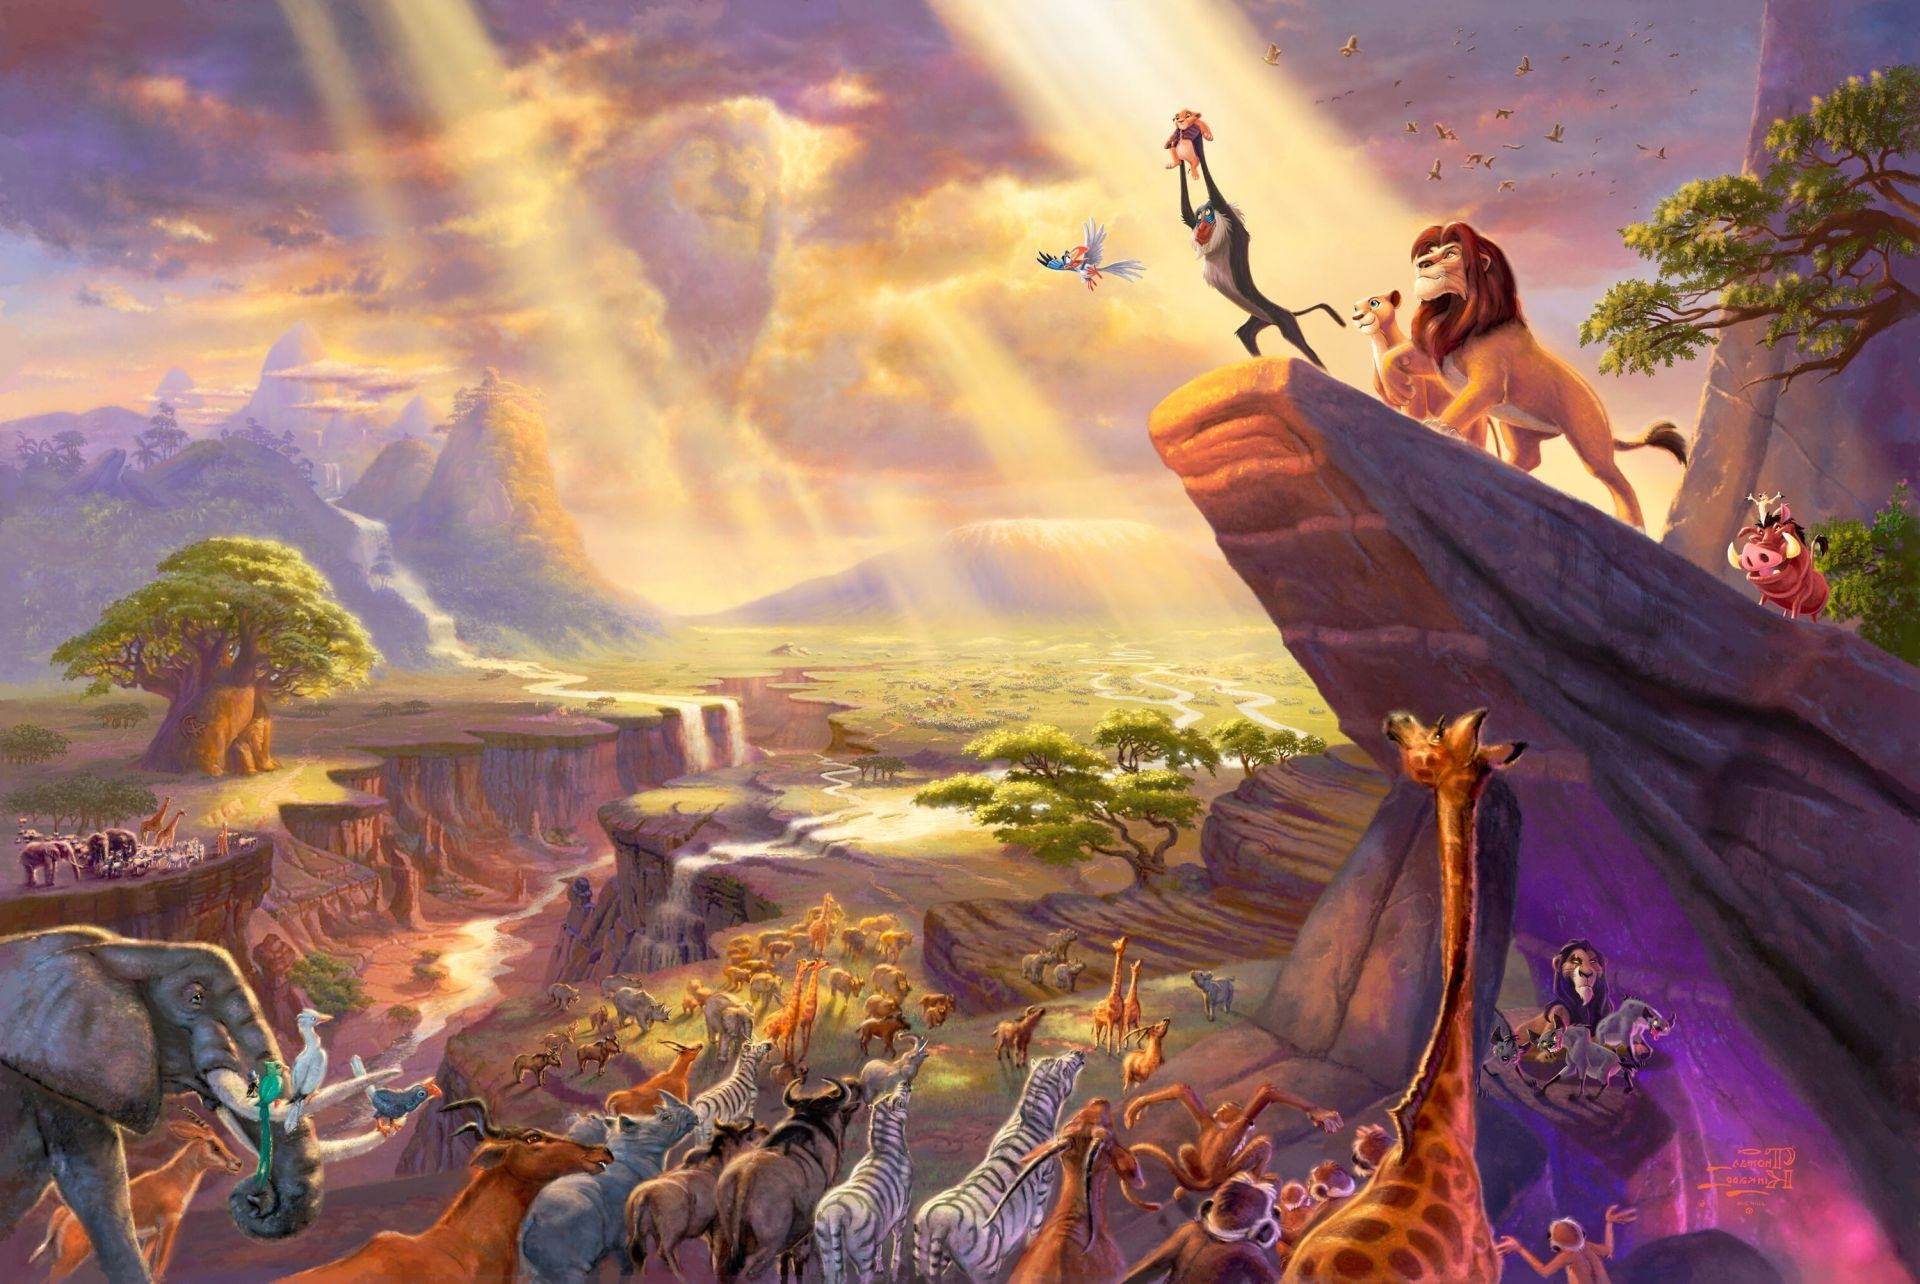 The Lion King Thomas Kinkade The Lion King Painting Paintin Android